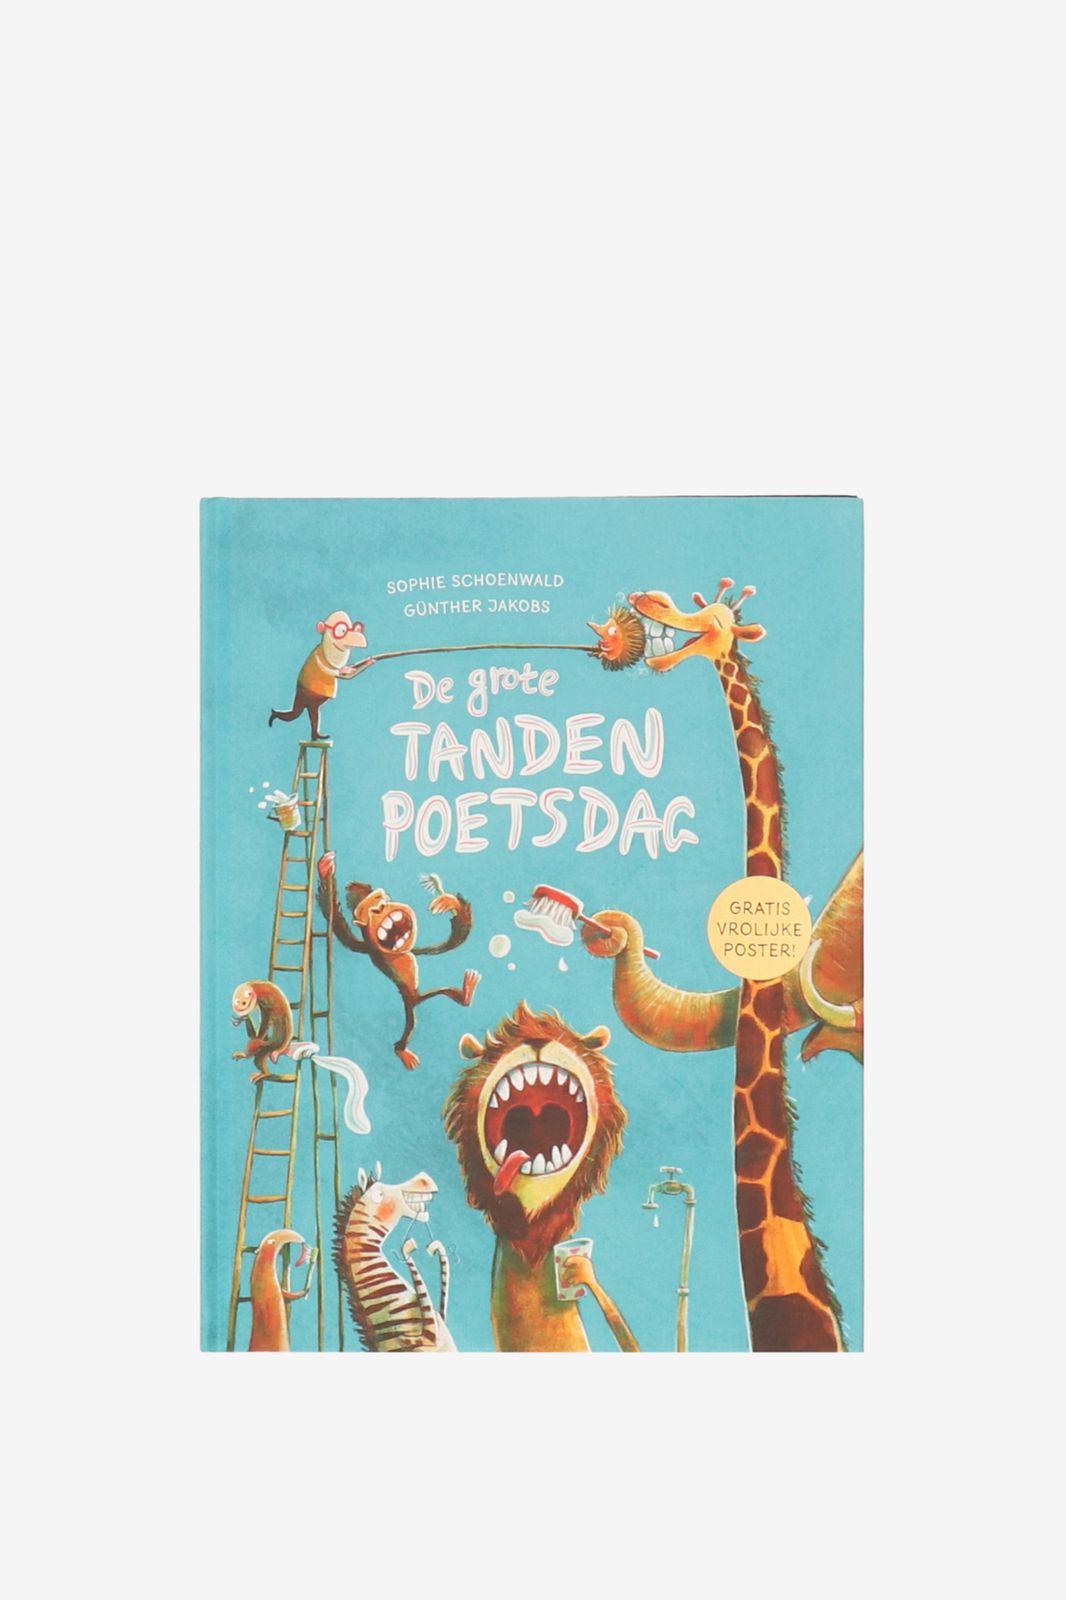 Boek de grote tandenpoetsdag